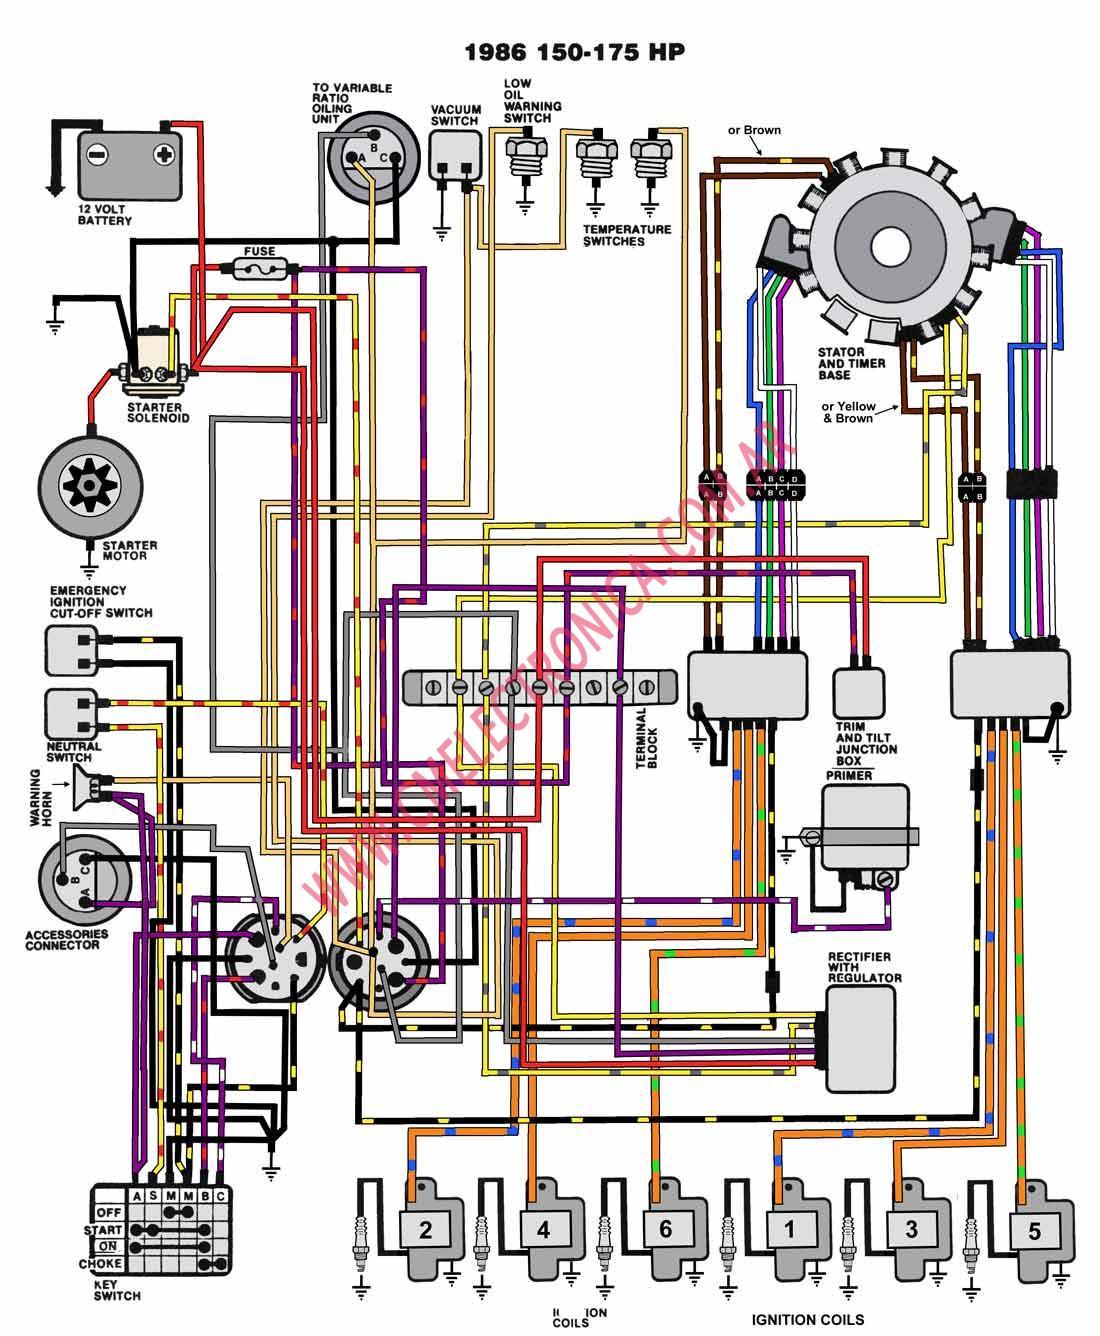 evinrude_johnson 1986_150_175?quality\\\\\\\\\\\\\\\=80\\\\\\\\\\\\\\\&strip\\\\\\\\\\\\\\\=all 2001 50hp mercury outboard wiring diagram wiring diagrams 2003 Mercury 115 Motor at alyssarenee.co